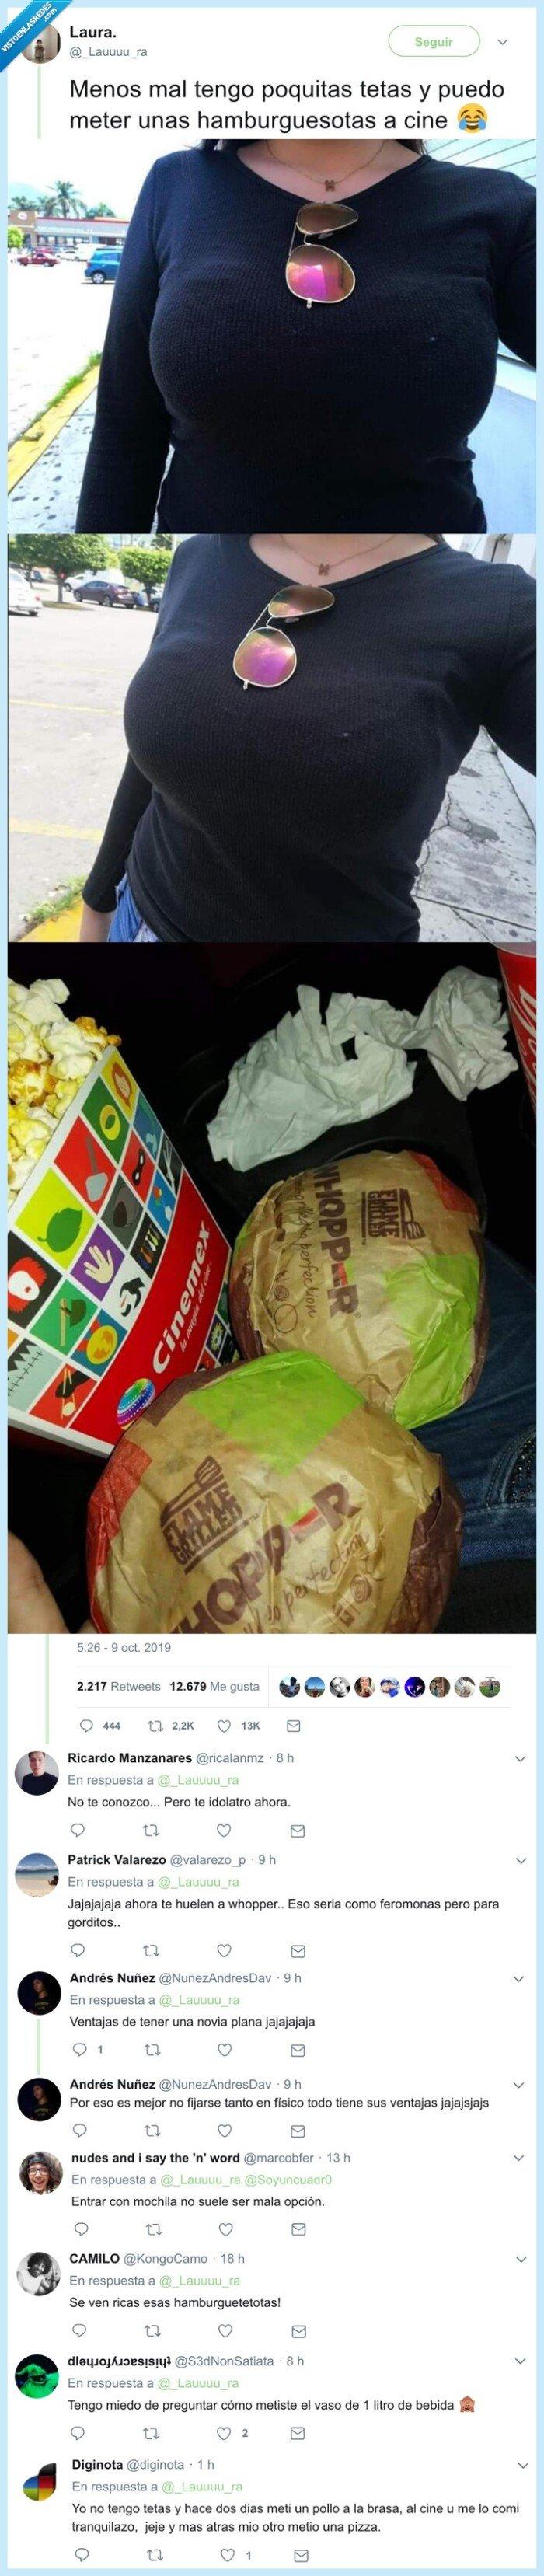 cine,escondidas,fake,gente,hamburguesas